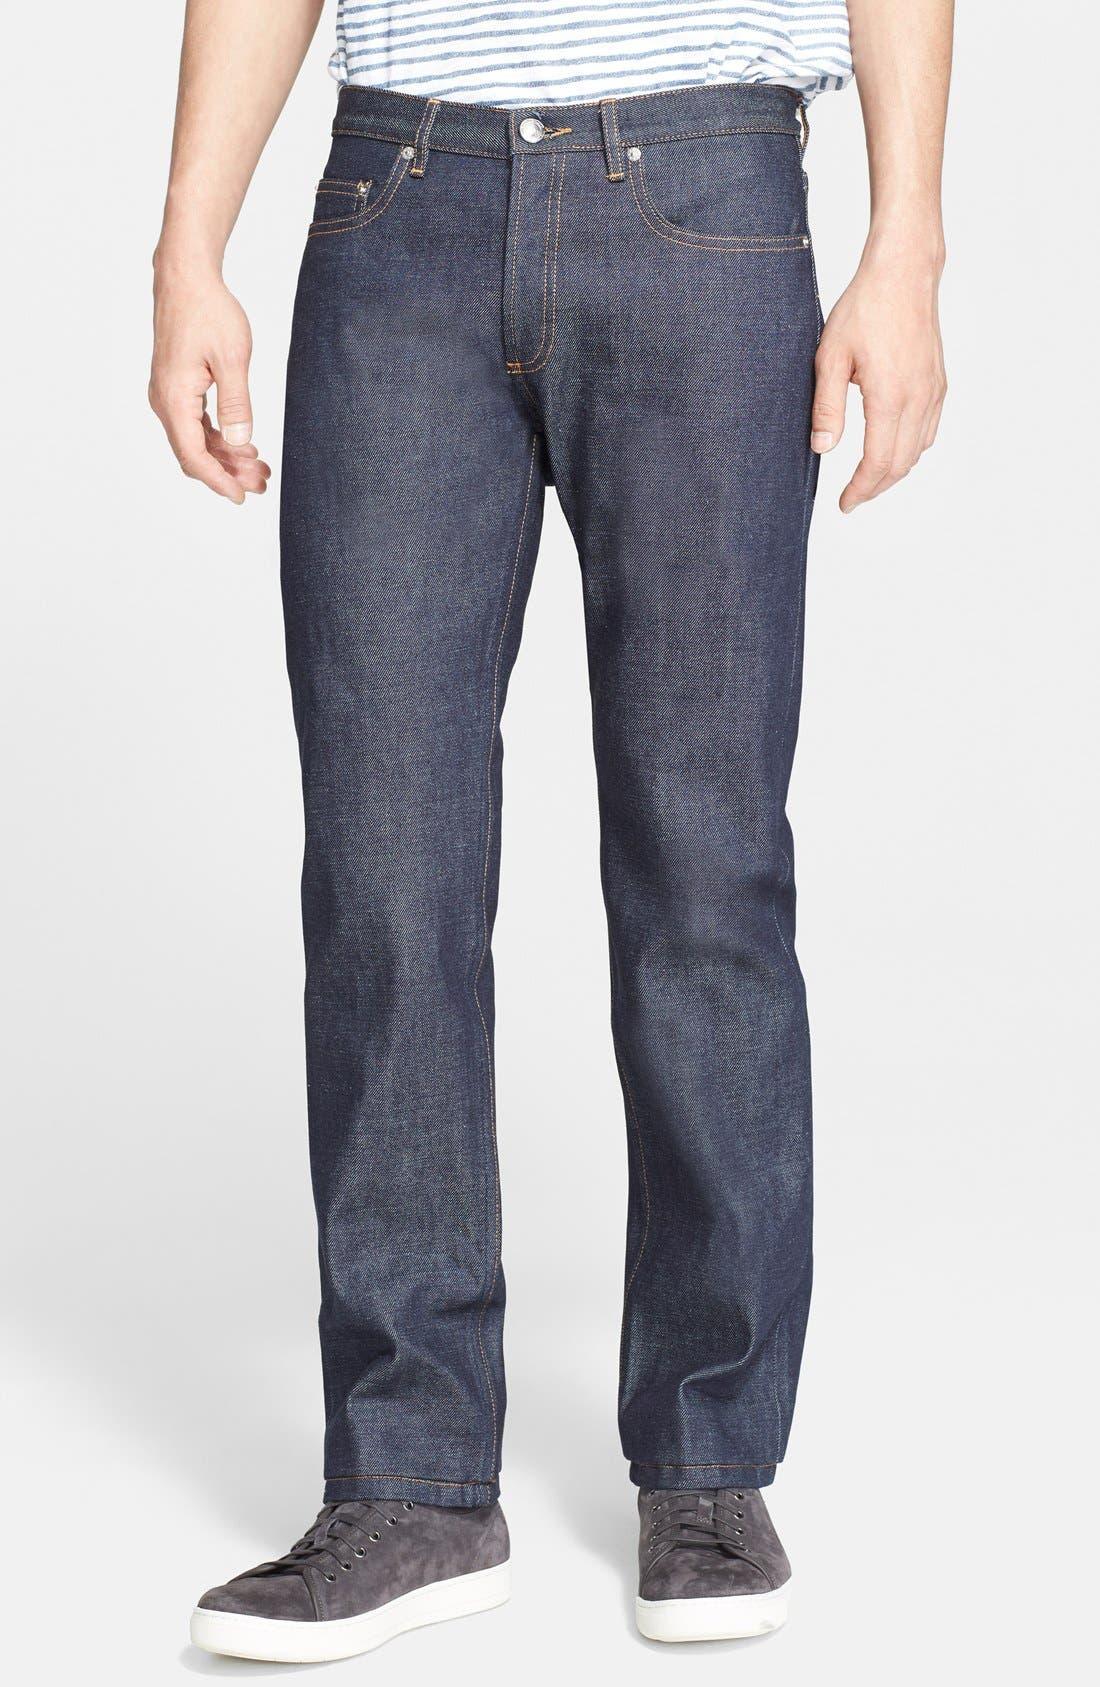 Alternate Image 1 Selected - A.P.C. New Standard Slim Straight Leg Selvedge Jeans (Indigo)